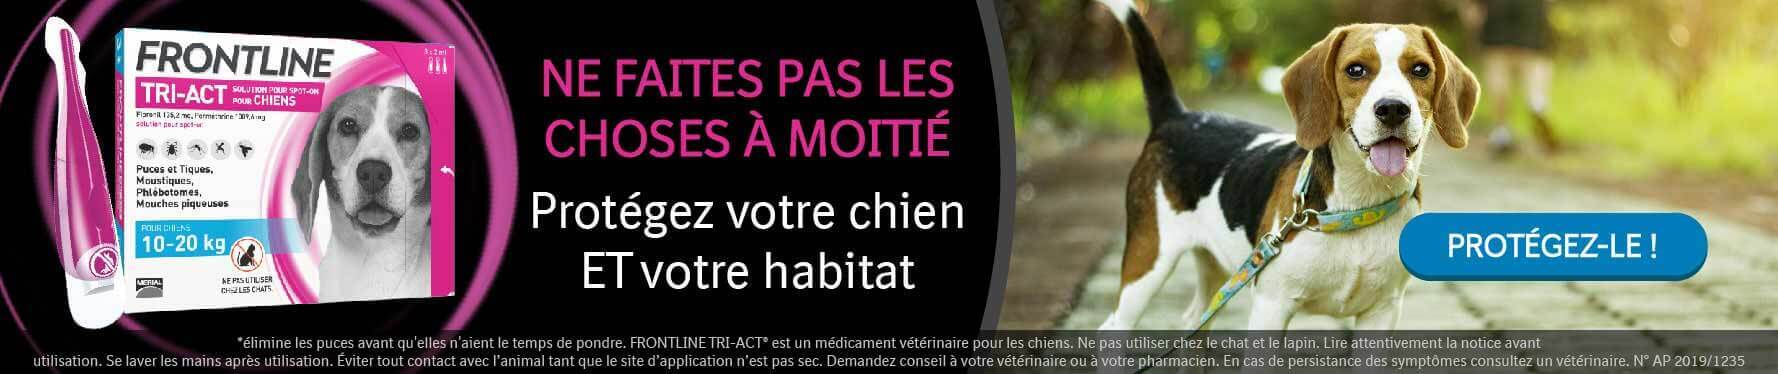 Antiparasitaires Frontline Tri-Act pour chien